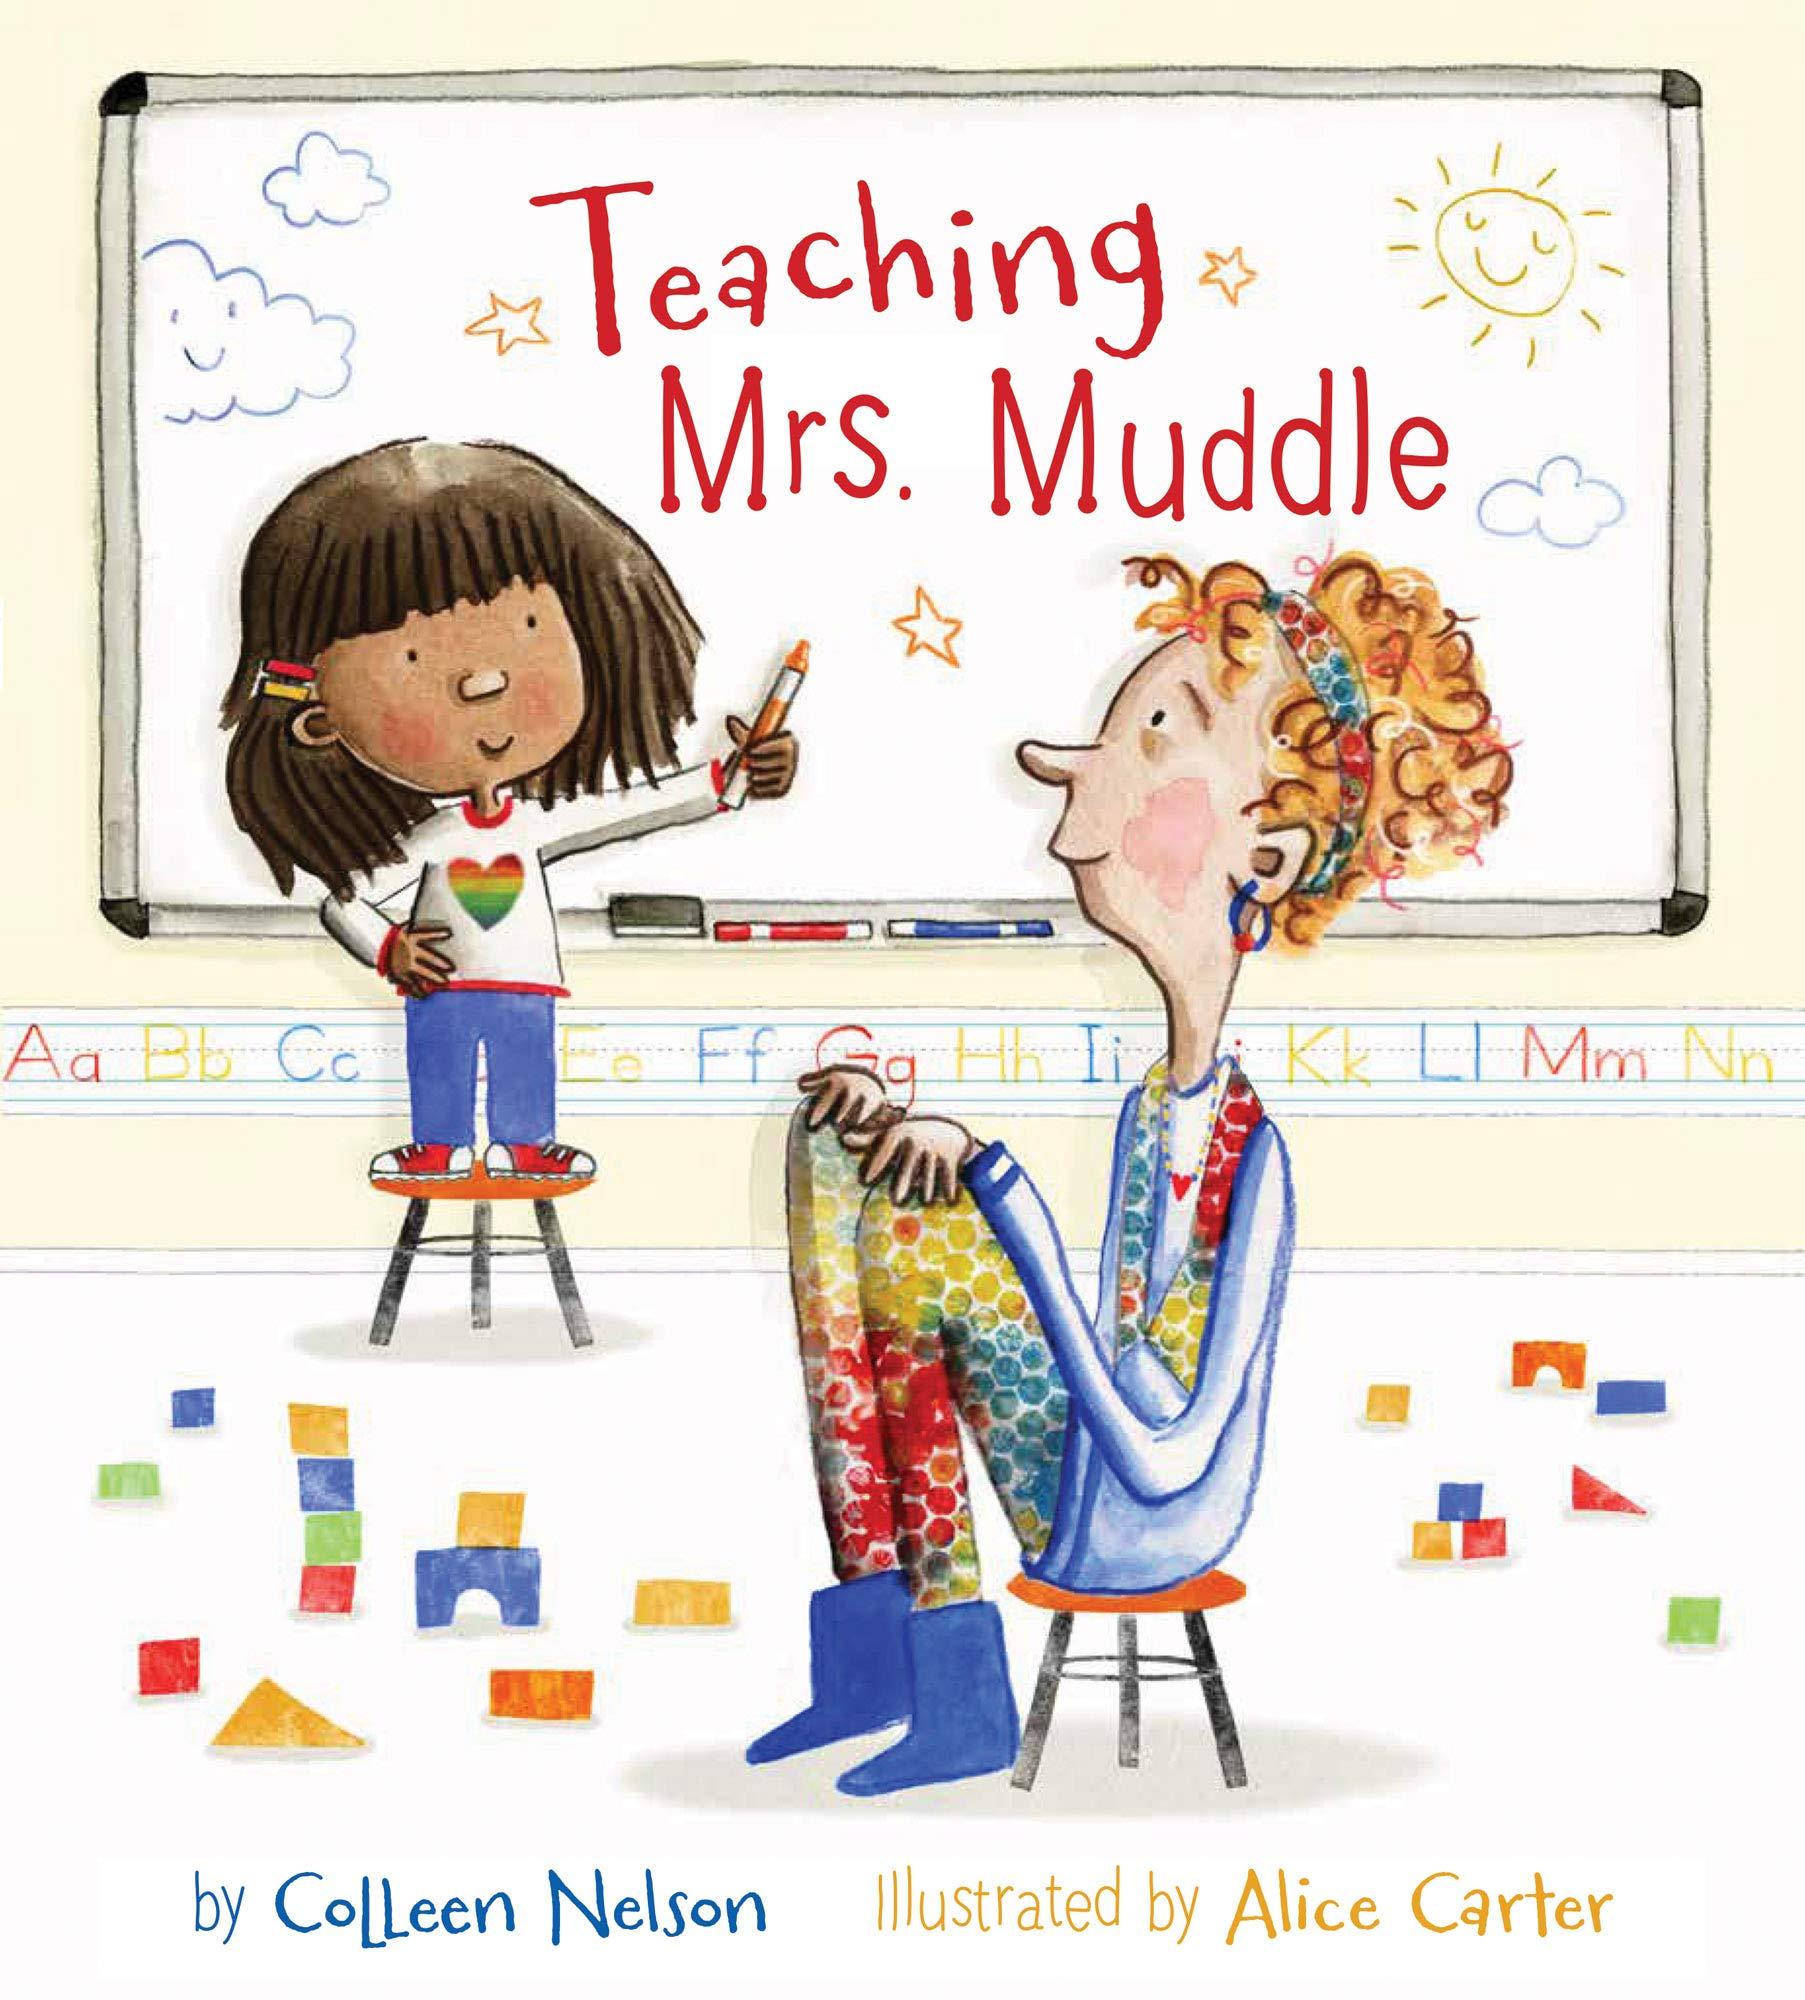 Teaching Mrs. Muddle: Nelson, Colleen, Carter, Alice: 9781772781311: Amazon.com: Books